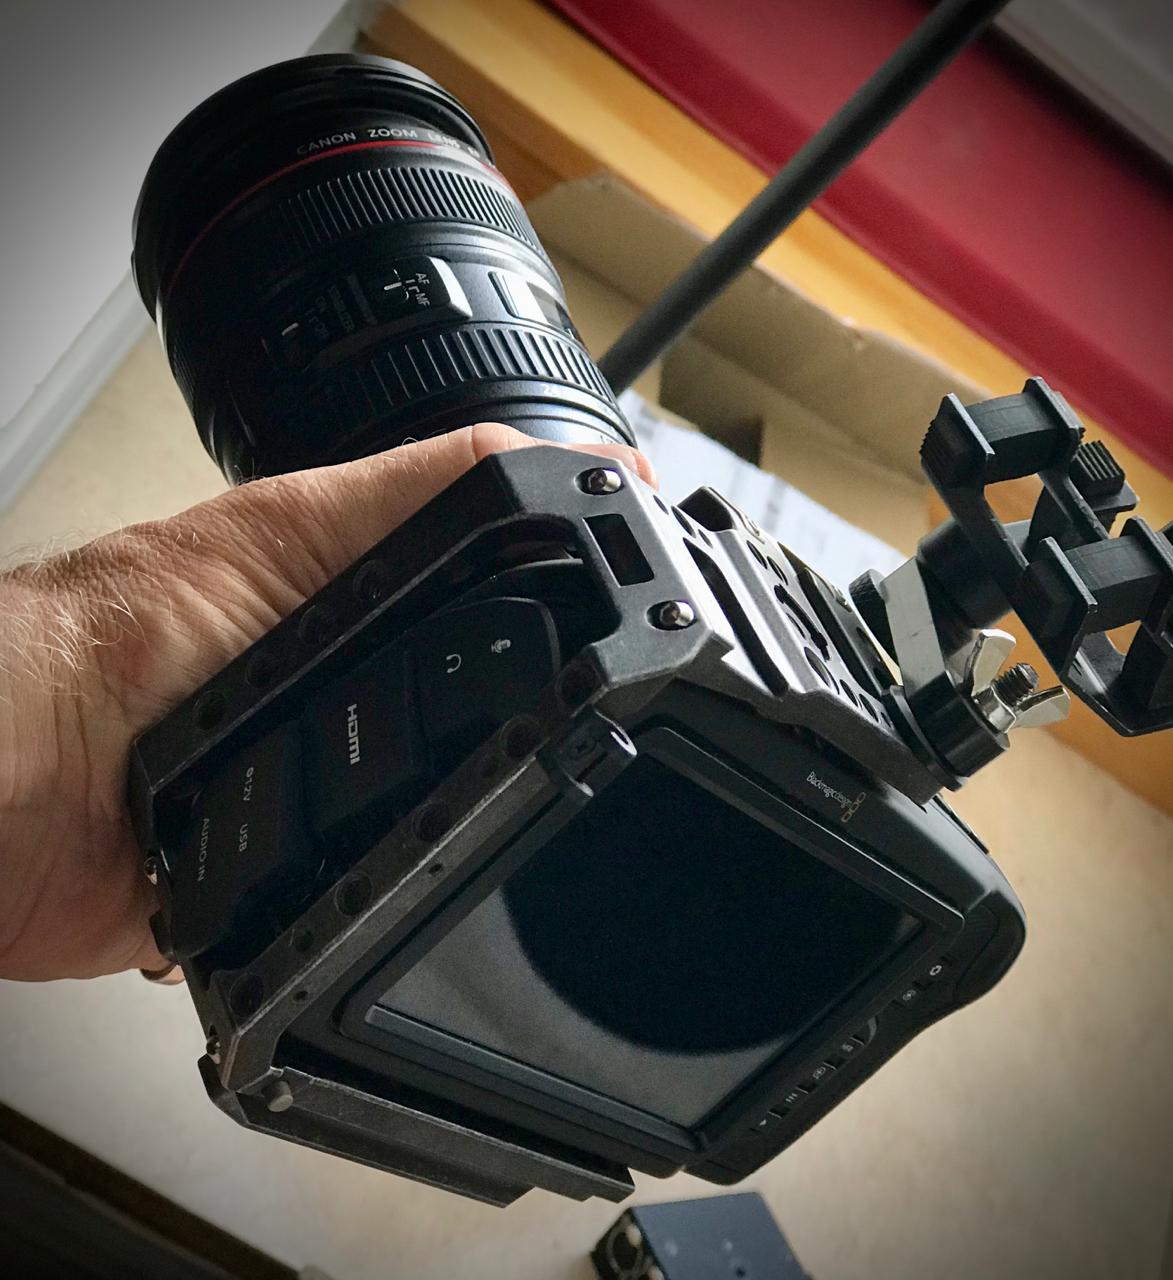 RAW Pro Res 4K - Black Magic Pocket Cinema Camera 4K with Tilta Cage and Metabones Speedbooster